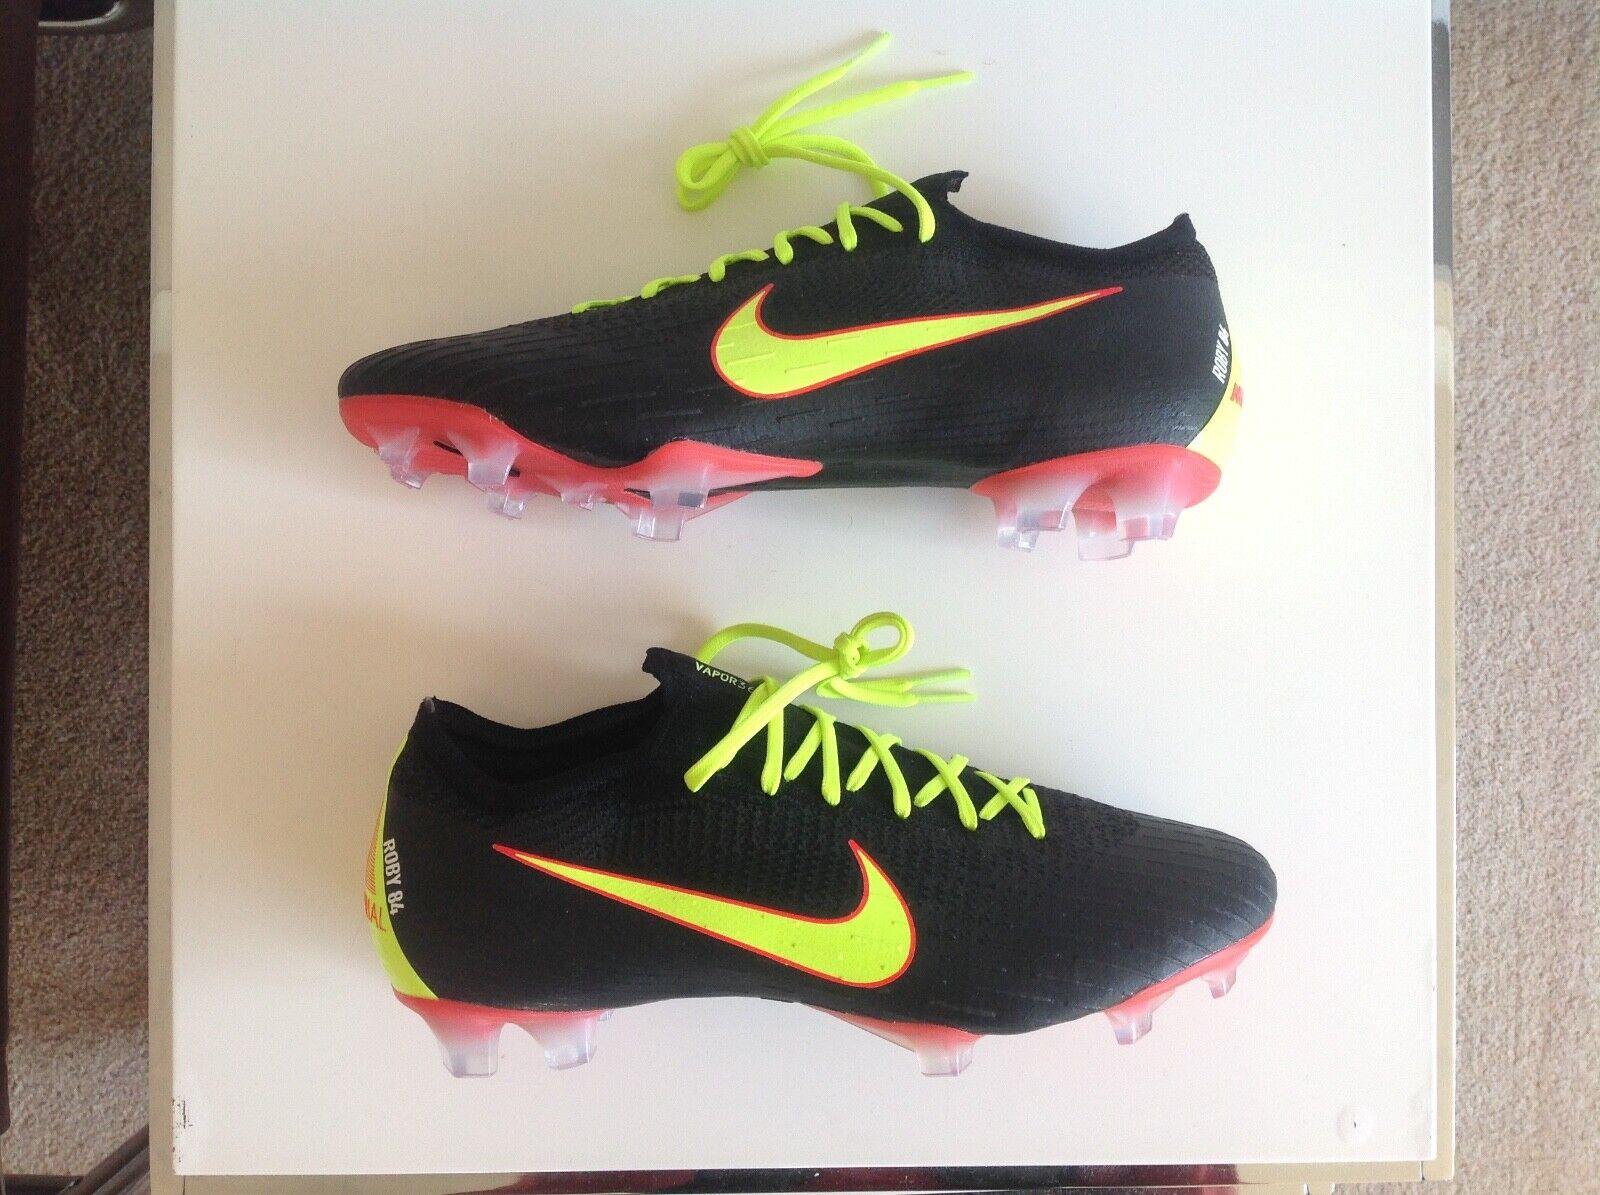 Nike ID Mercurial Vapor XII Elite Fg botas De Fútbol 8.5 nos 9.5 EUR 43 Negro